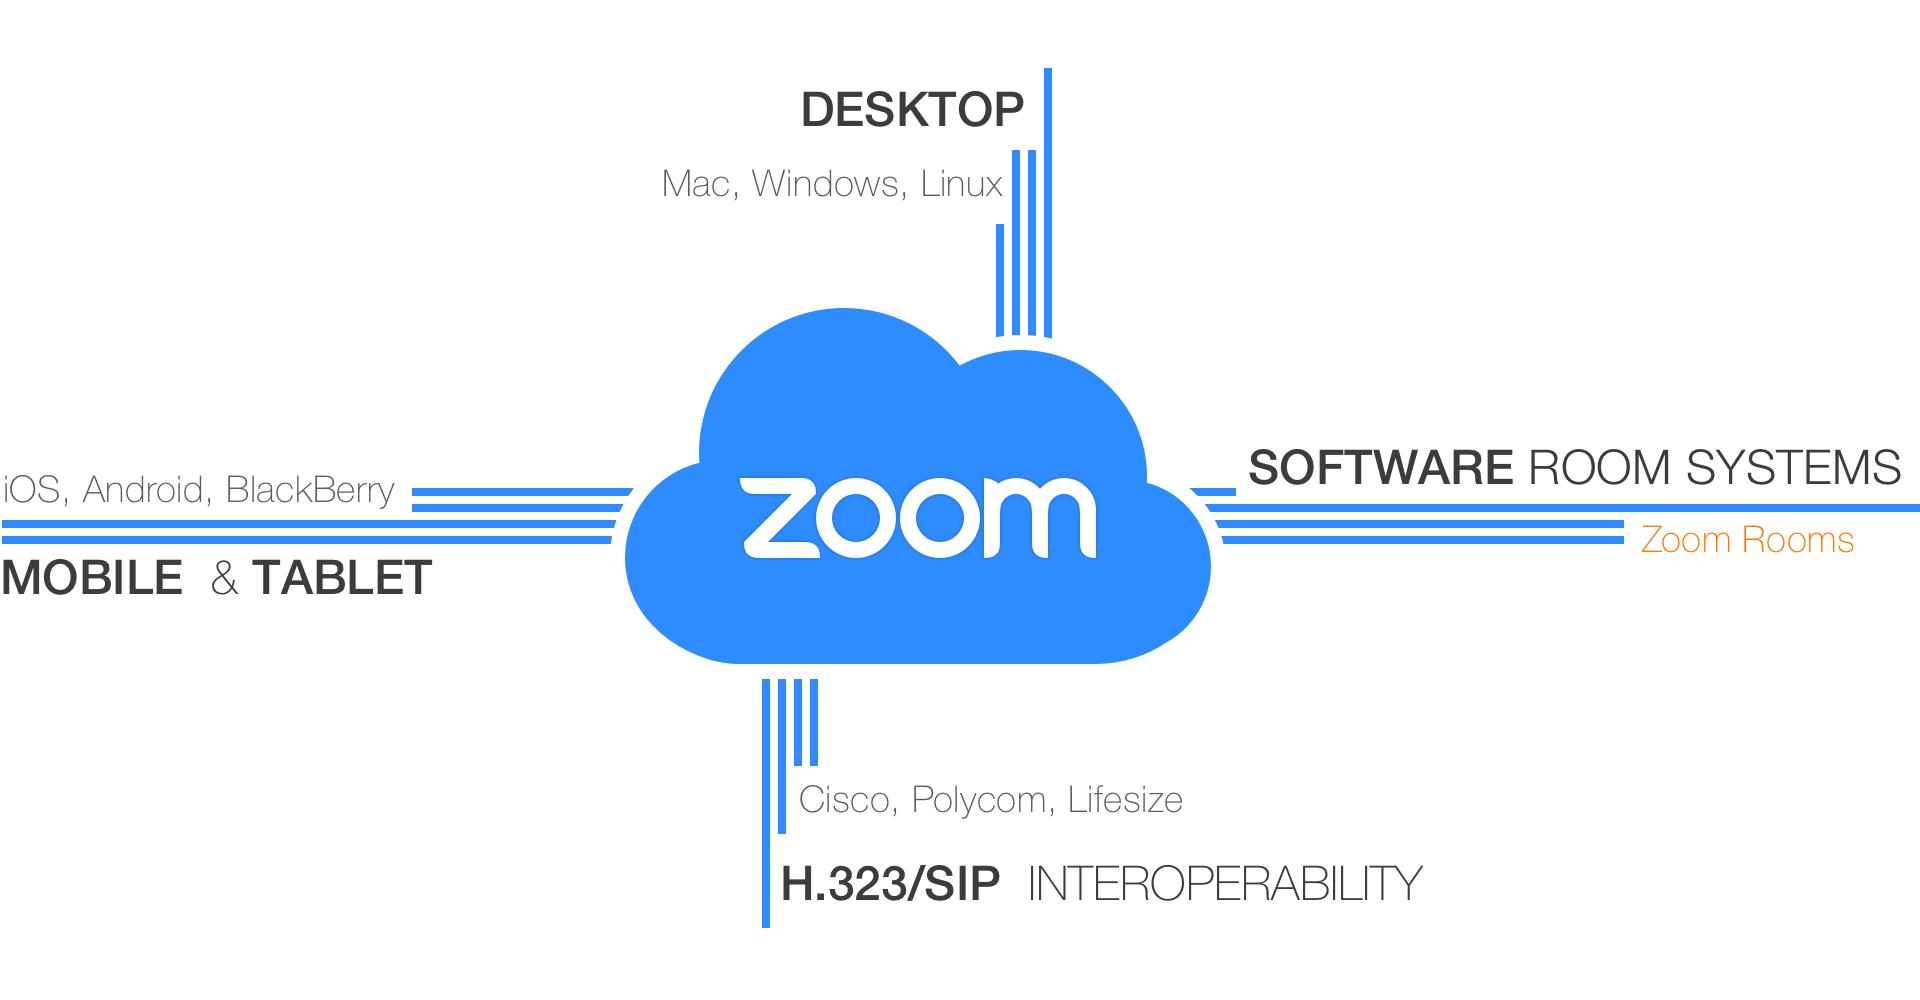 Zoom unifies cloud video conferencing, simple online